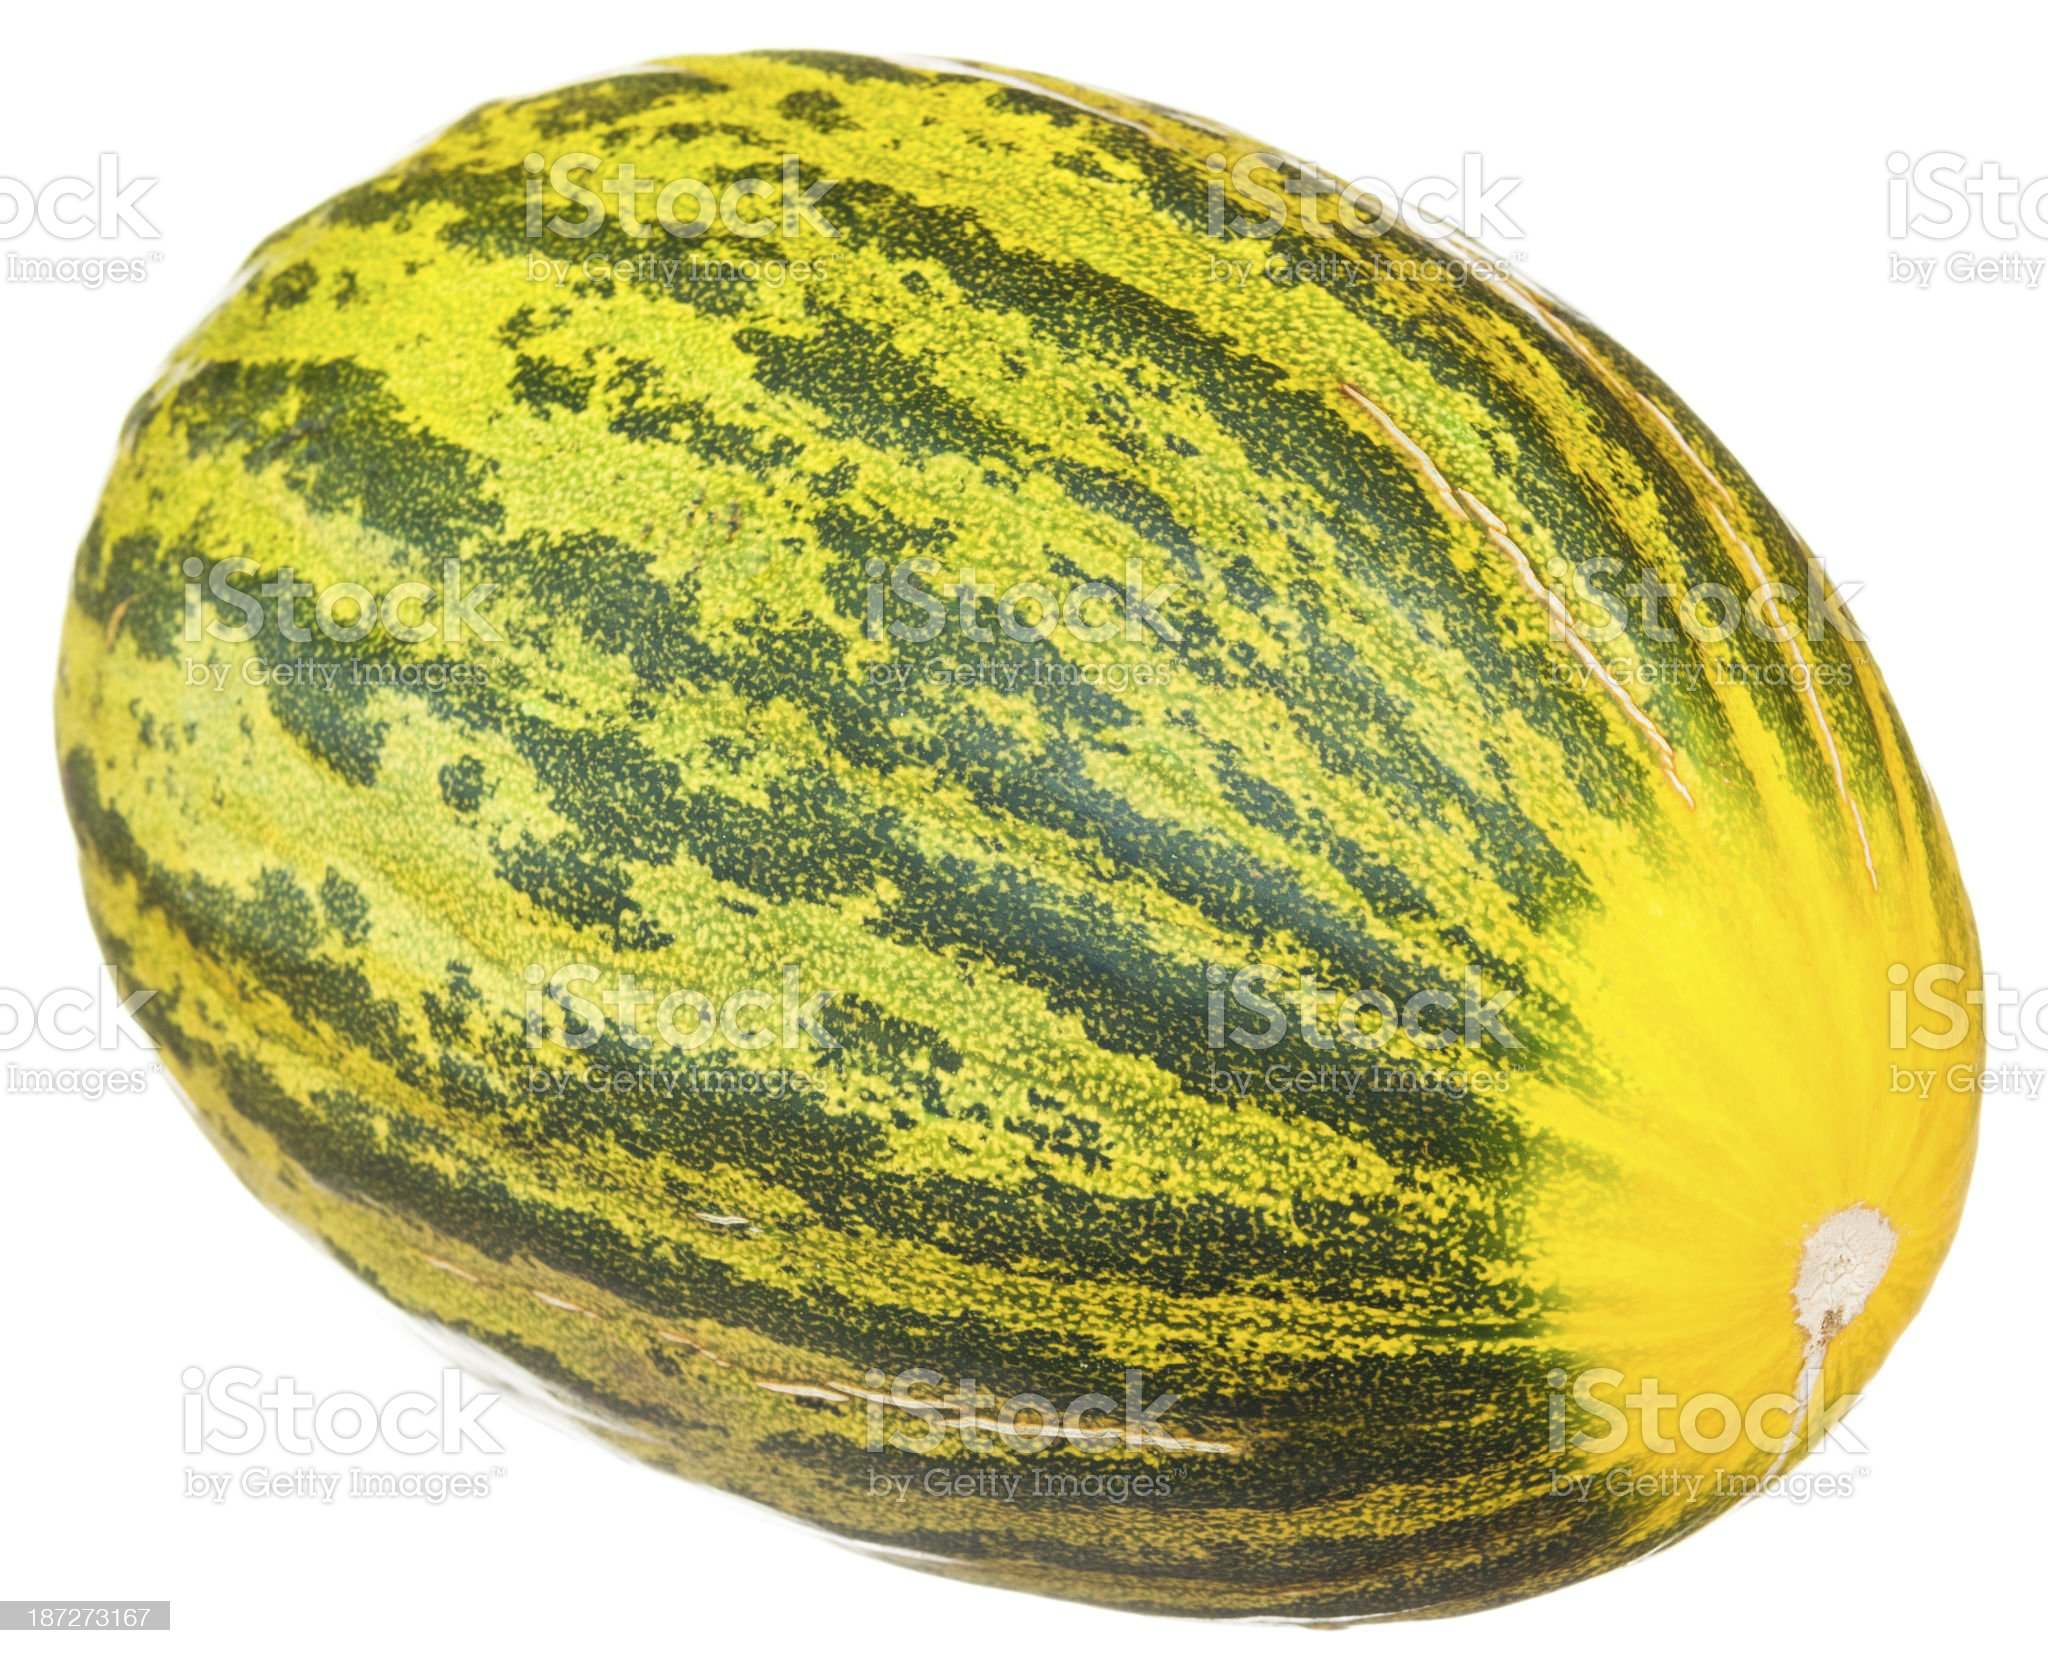 Piel de Sapo melon royalty-free stock photo